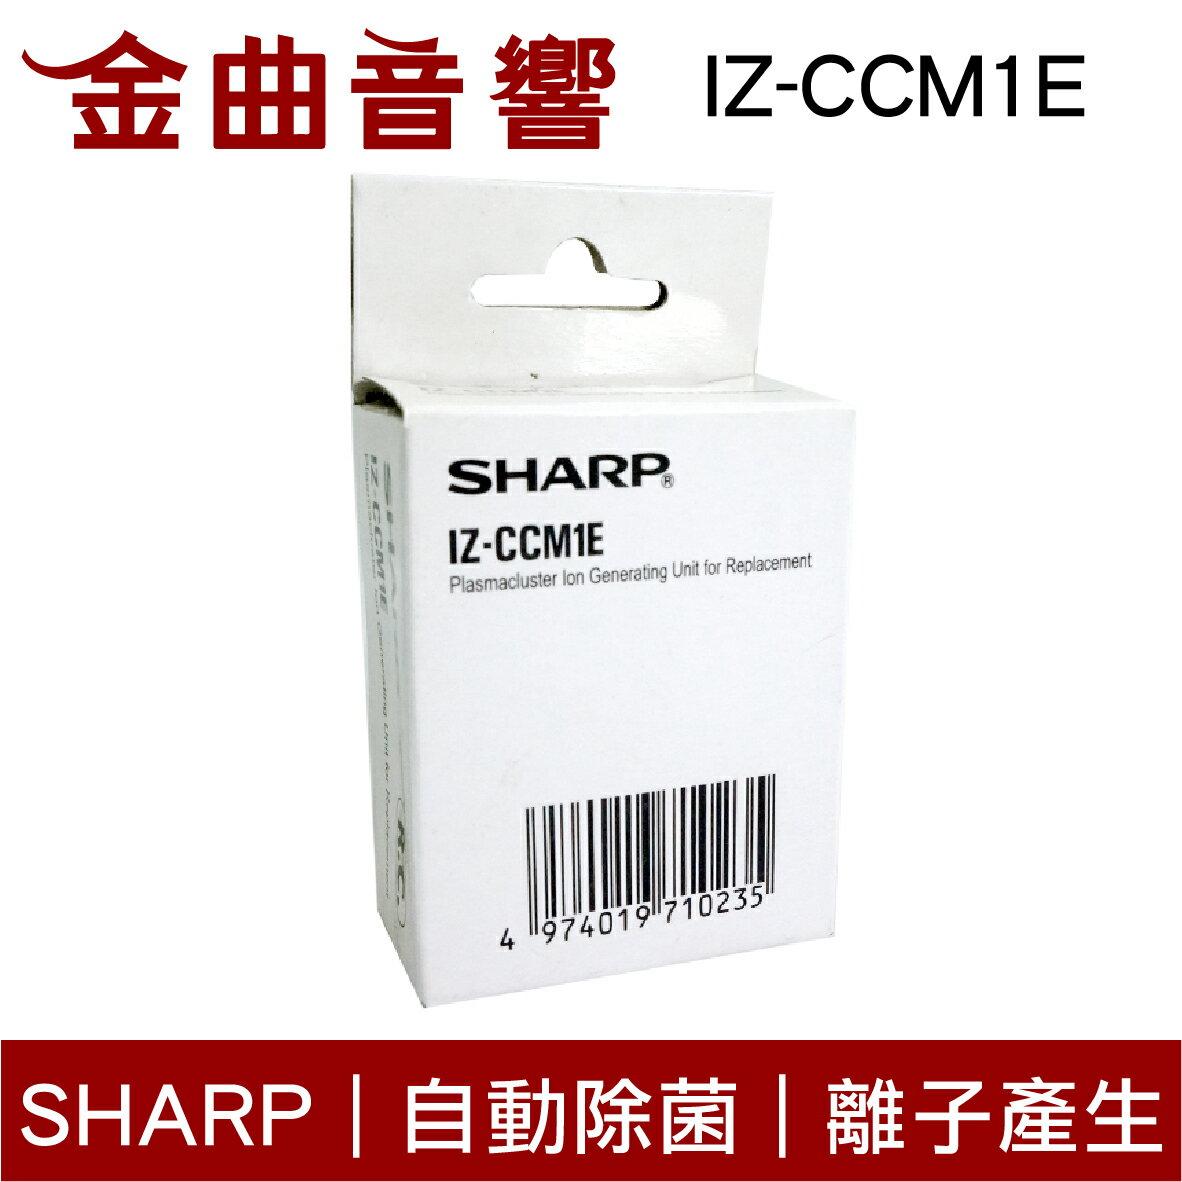 SHARP 夏普 IZ-CCM1E 自動除菌離子產生器交換元件 | 金曲音響